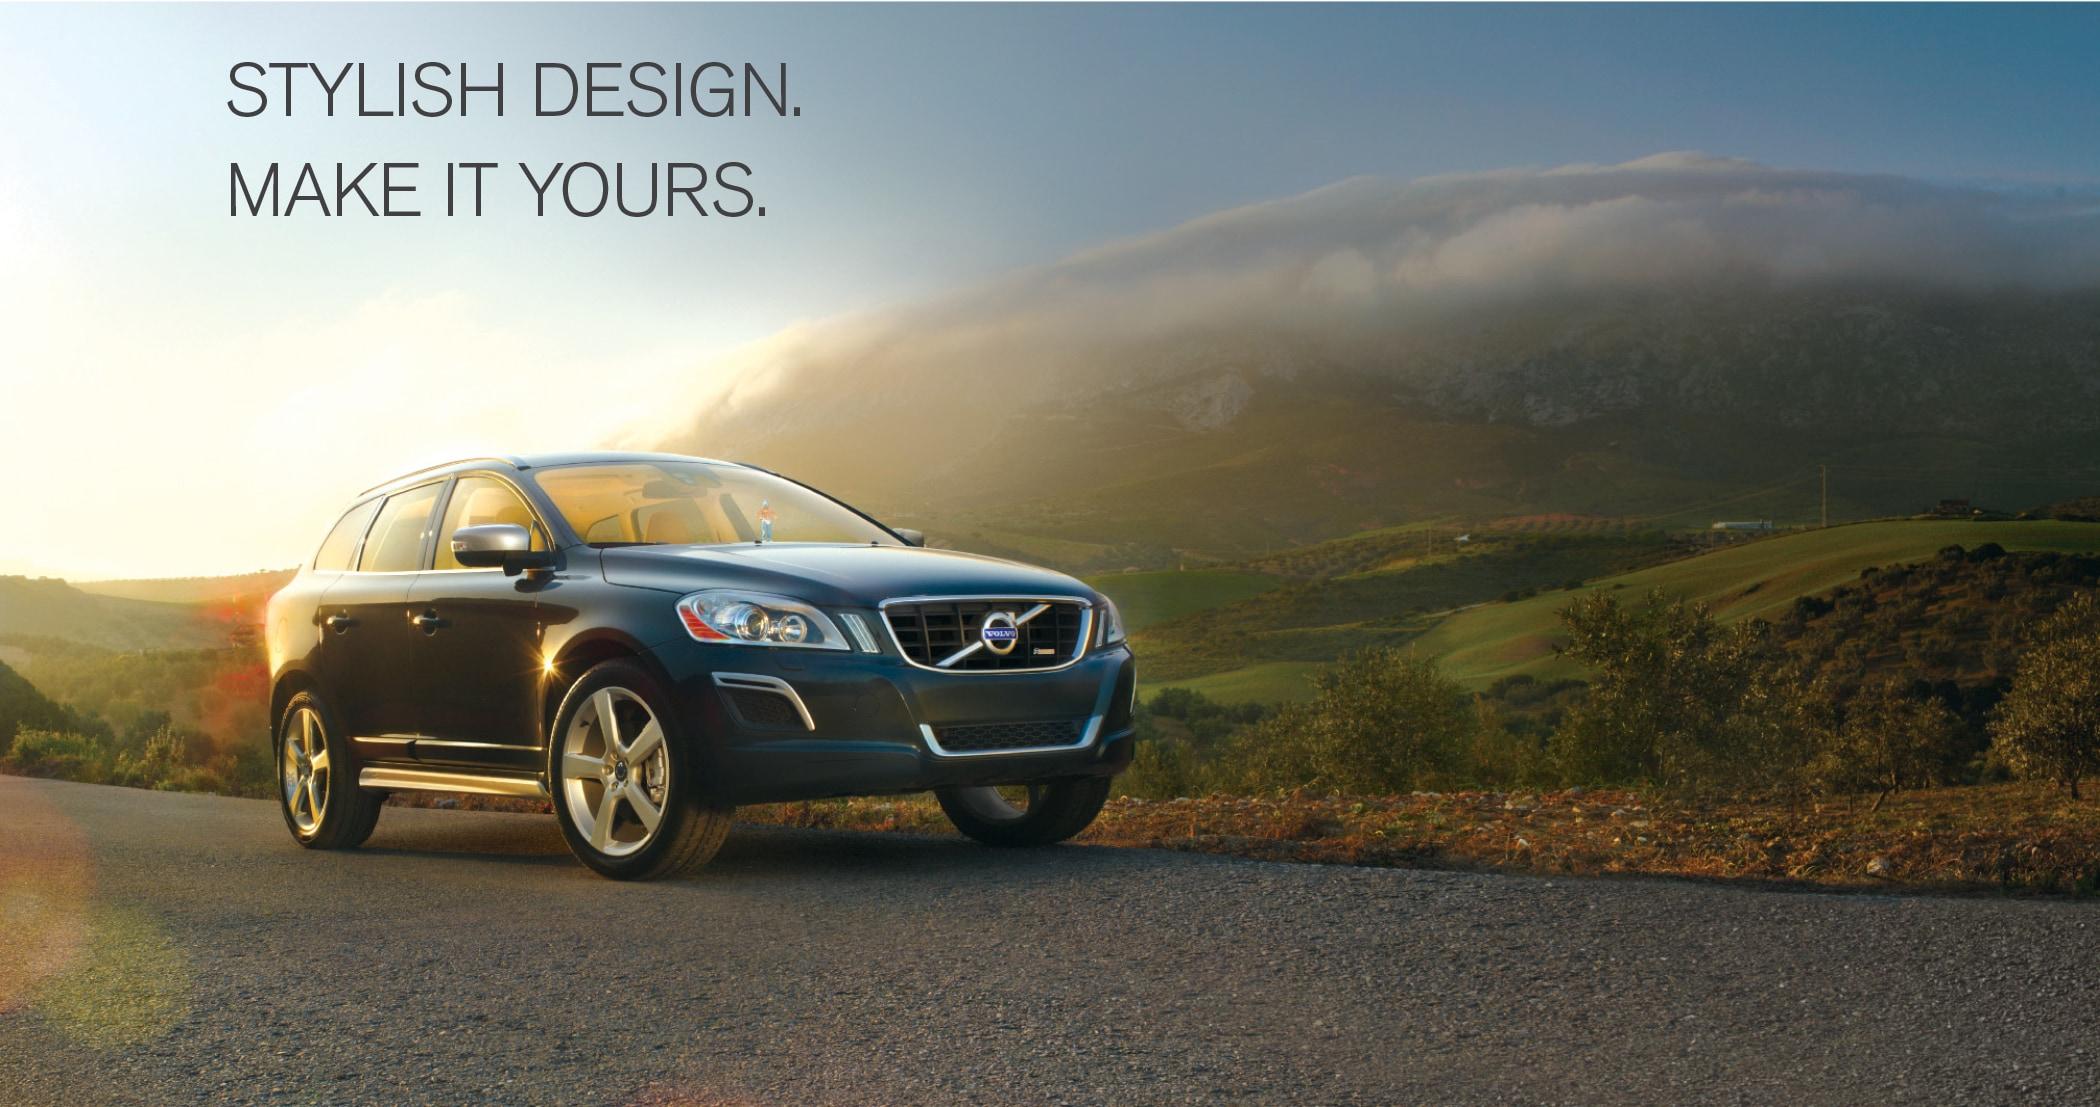 Why Buy Volvo Cpo At Union Park Volvo Union Park Volvo Cars